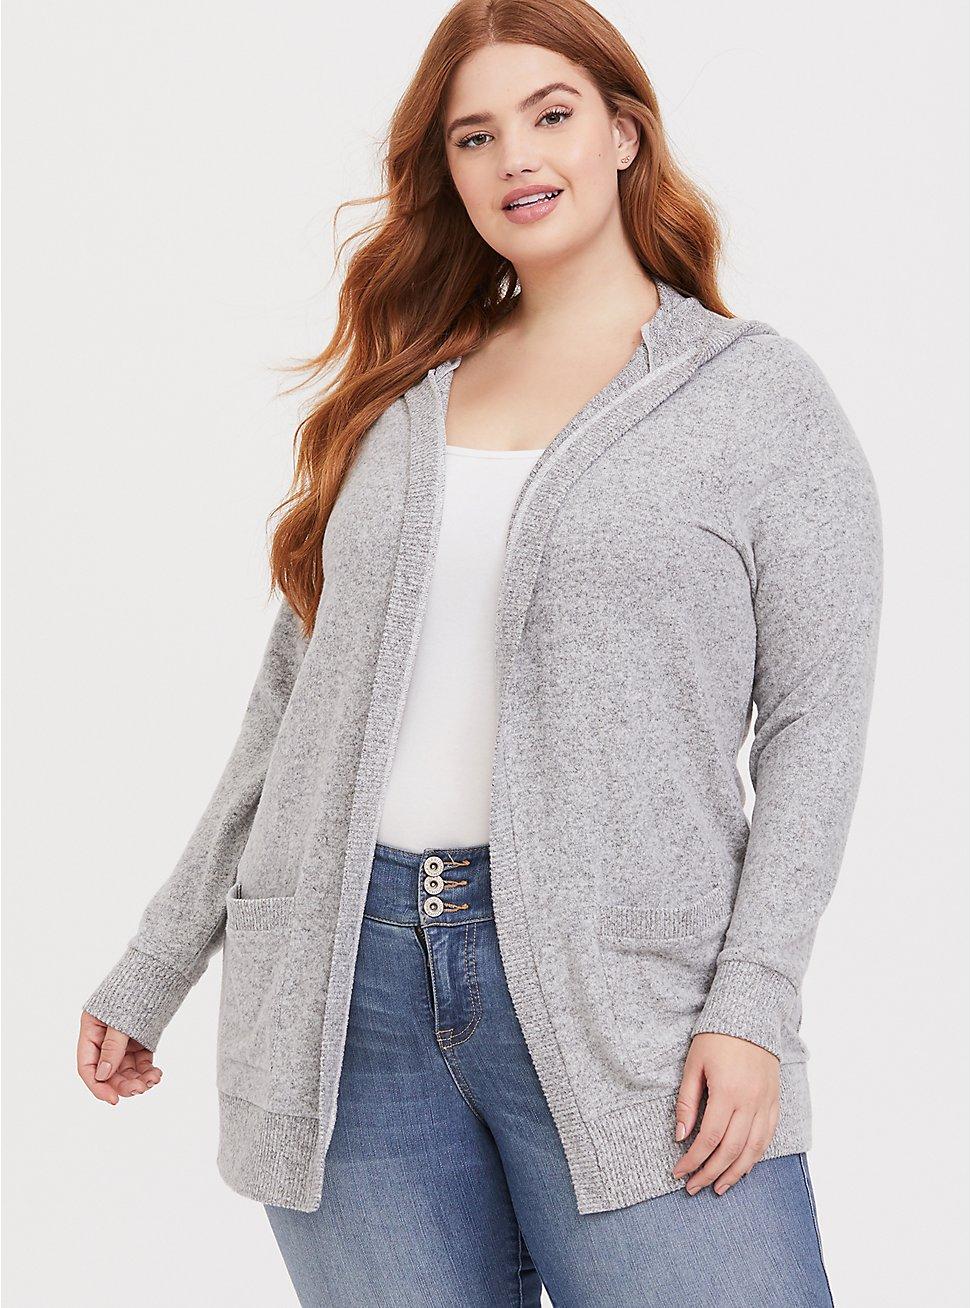 Plus Size Super Soft Plush Light Grey Hooded Cardigan, HEATHER GREY, hi-res